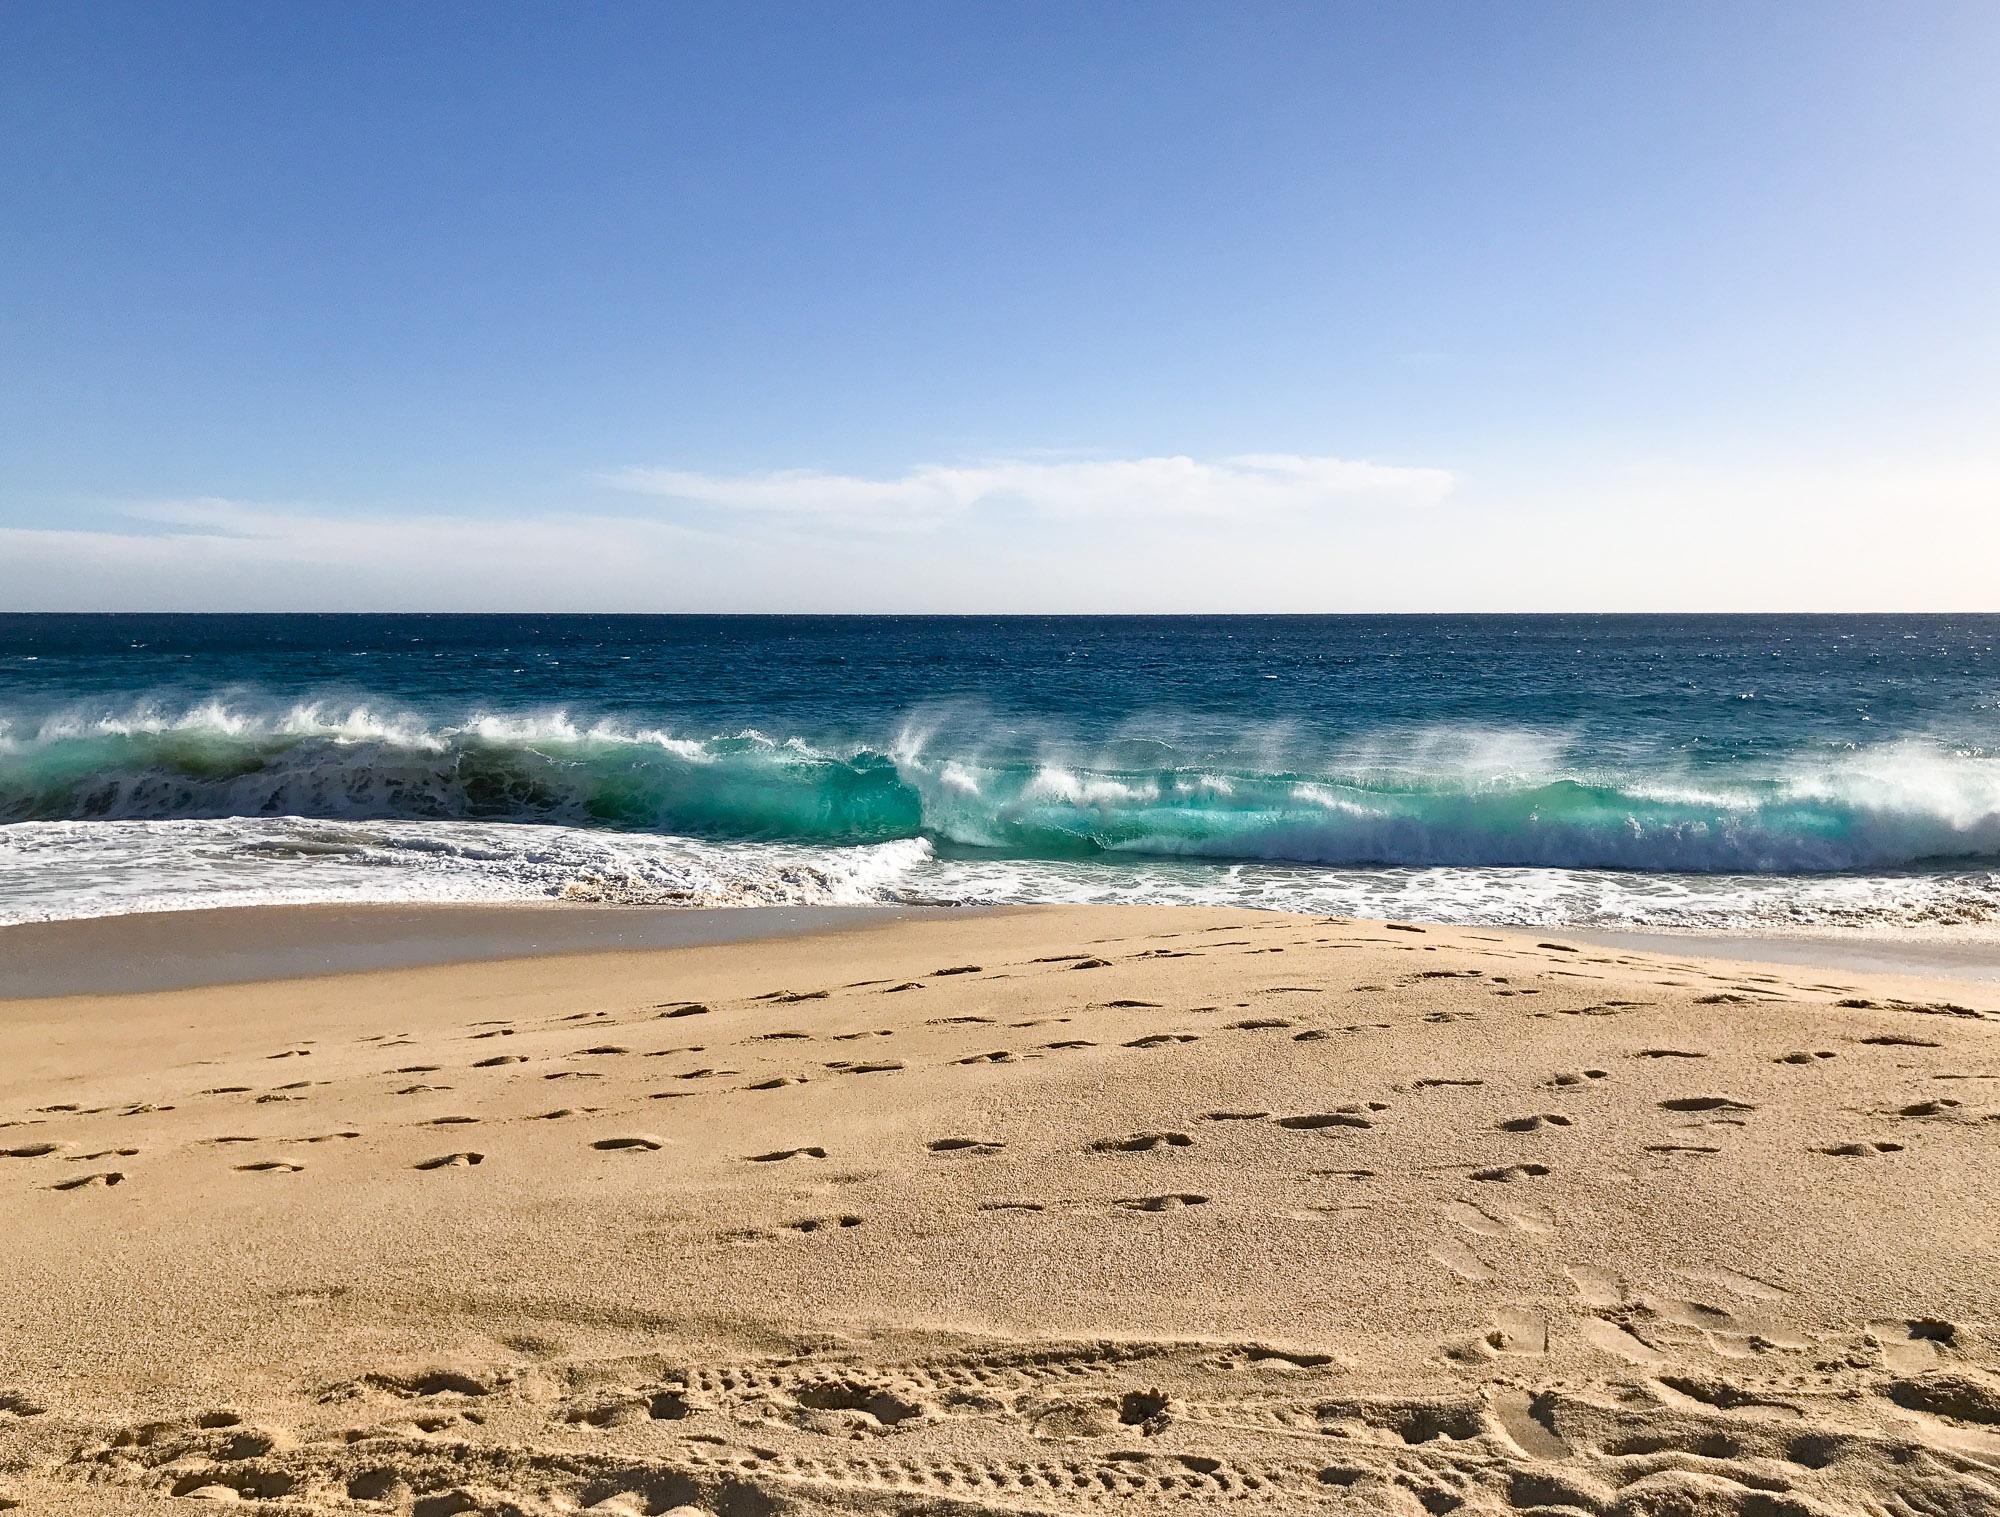 pacific-ocean-wave-cabo-mexico.jpg